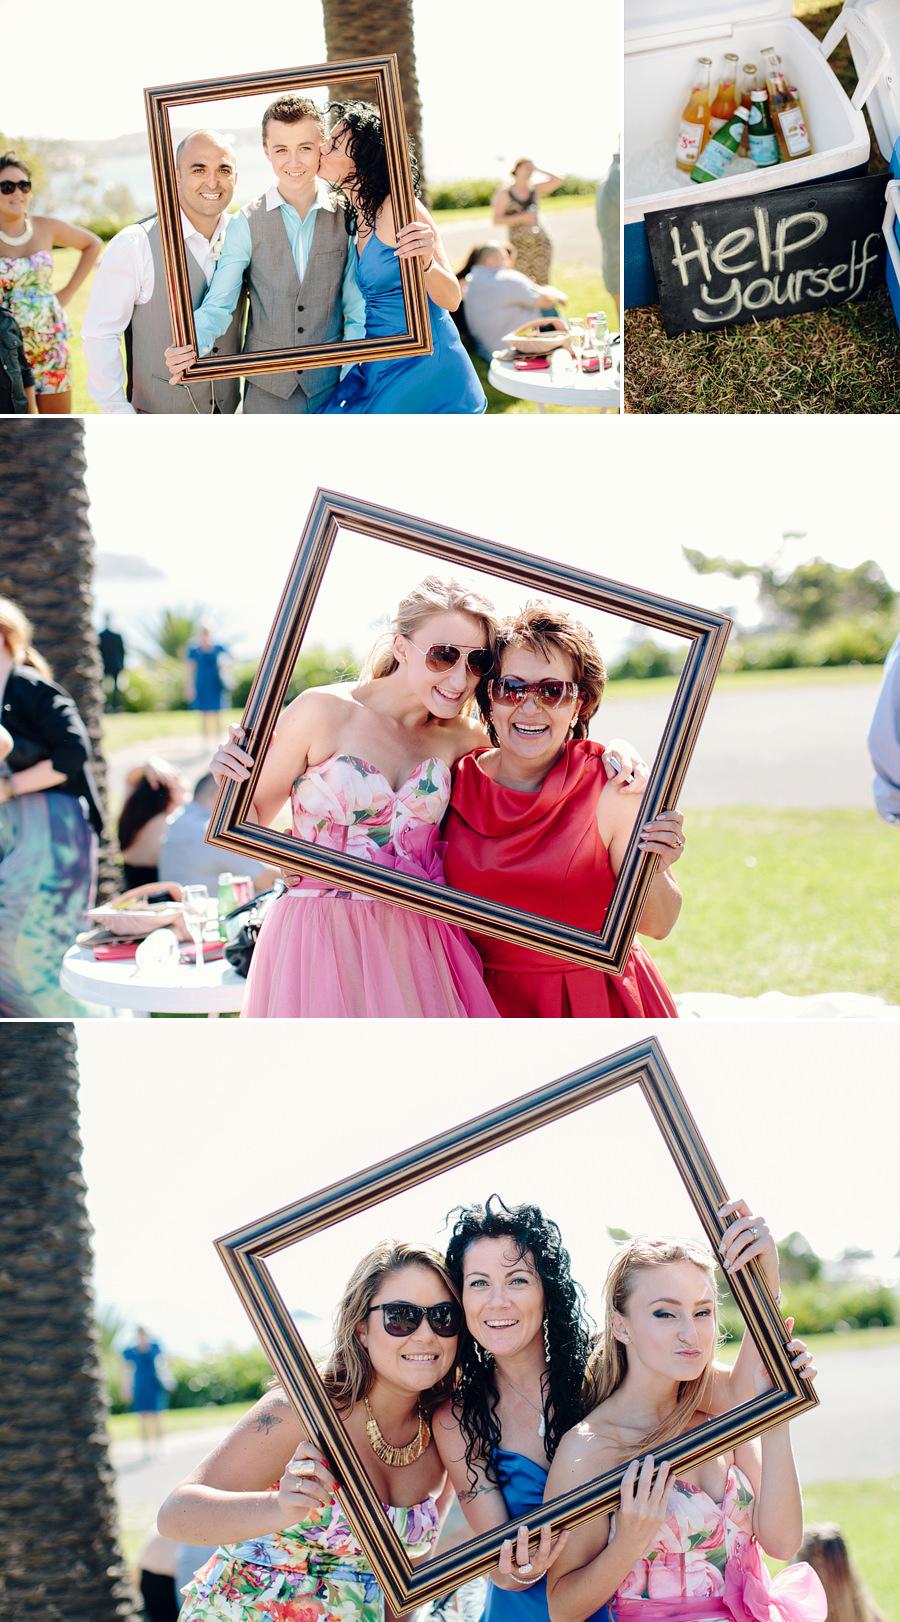 Modern Wedding Photographer: Guests